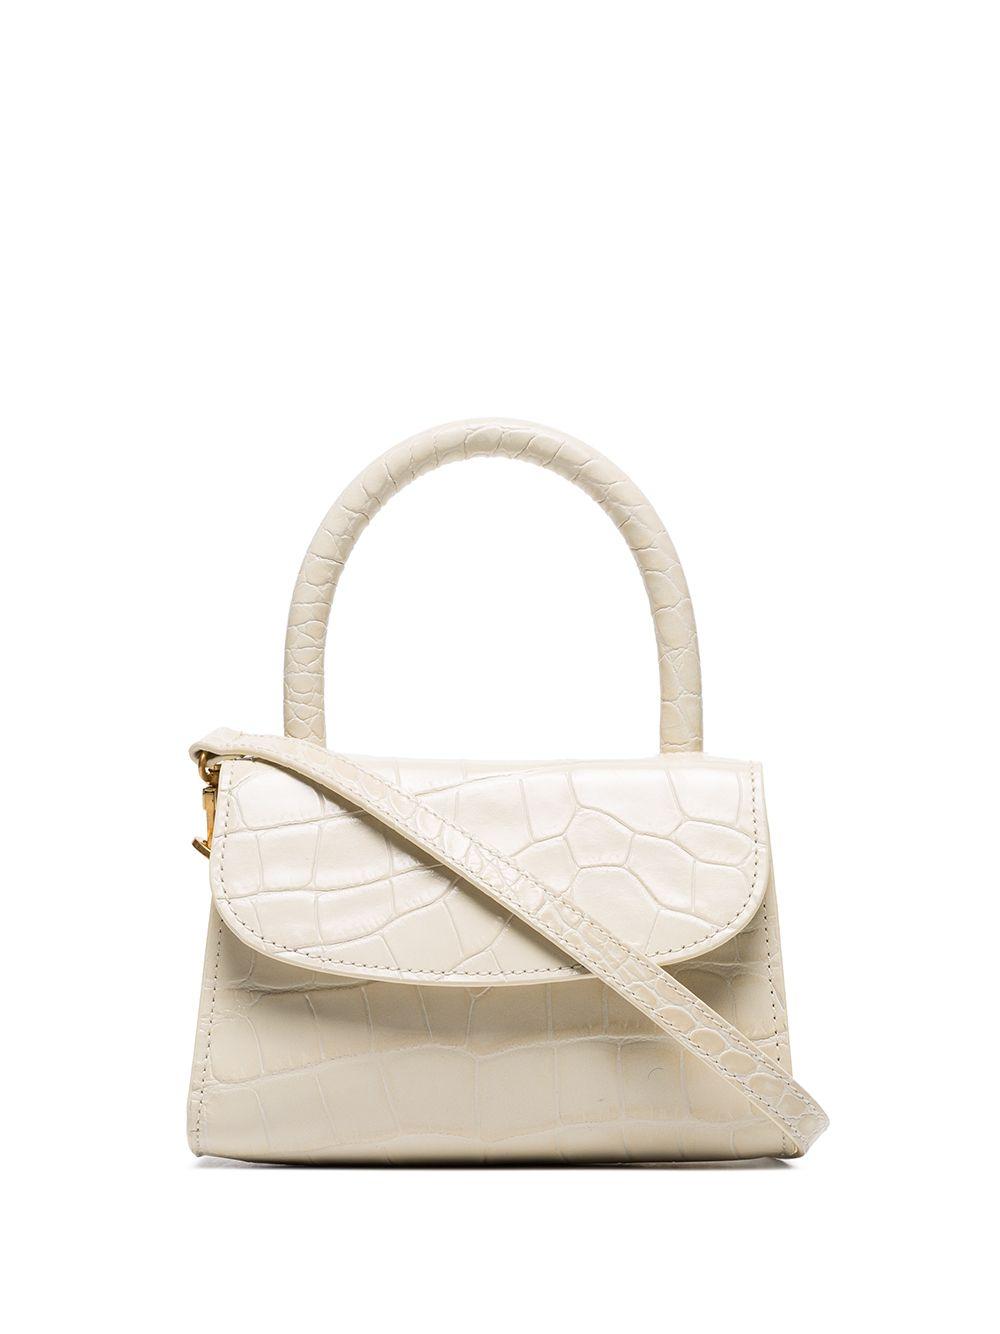 Croco Embossed Mini Bag